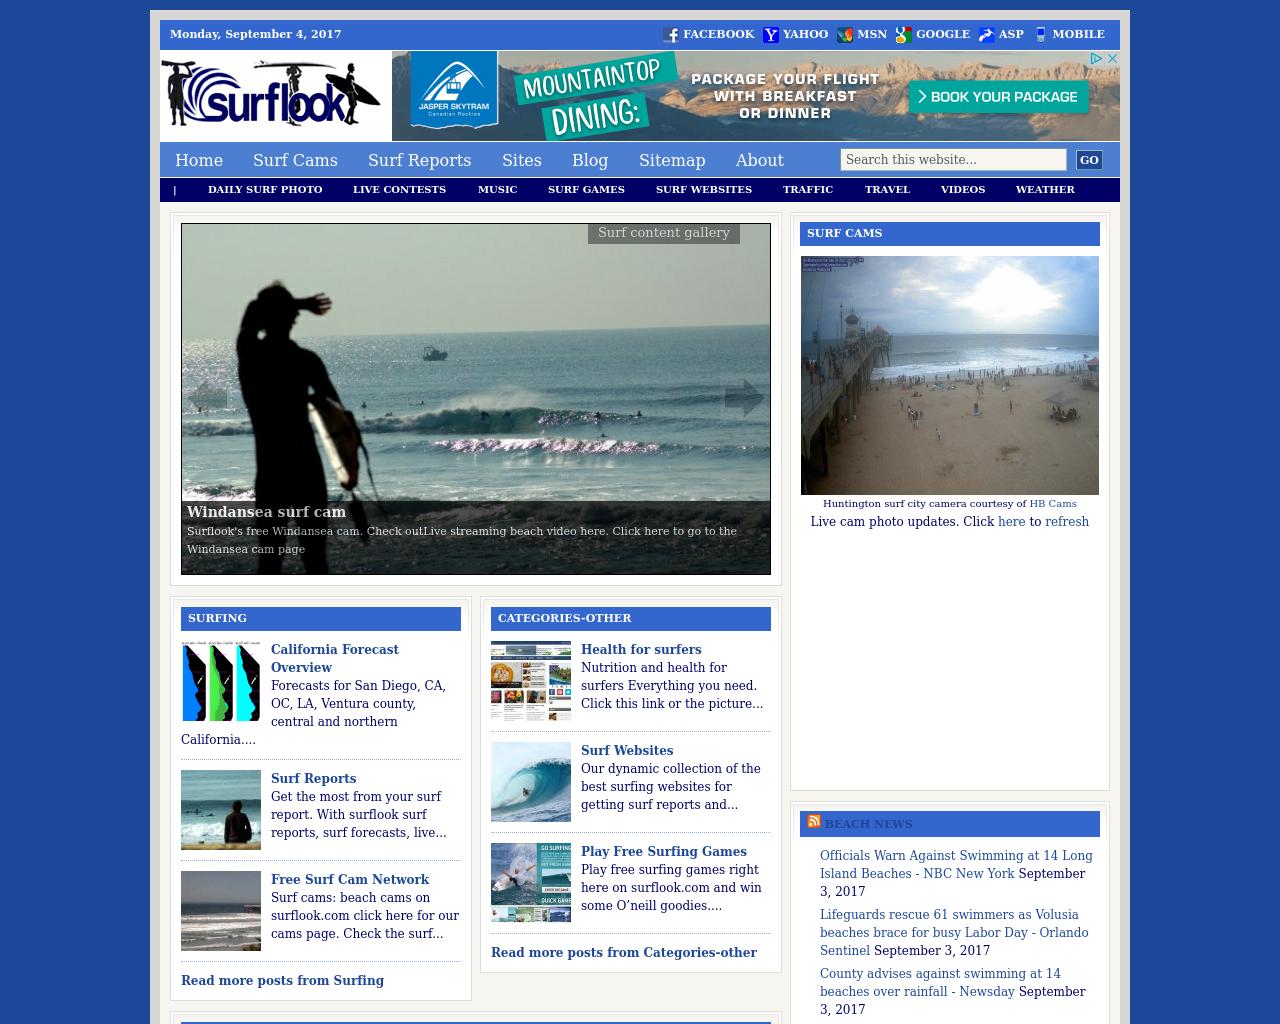 surflook-Advertising-Reviews-Pricing